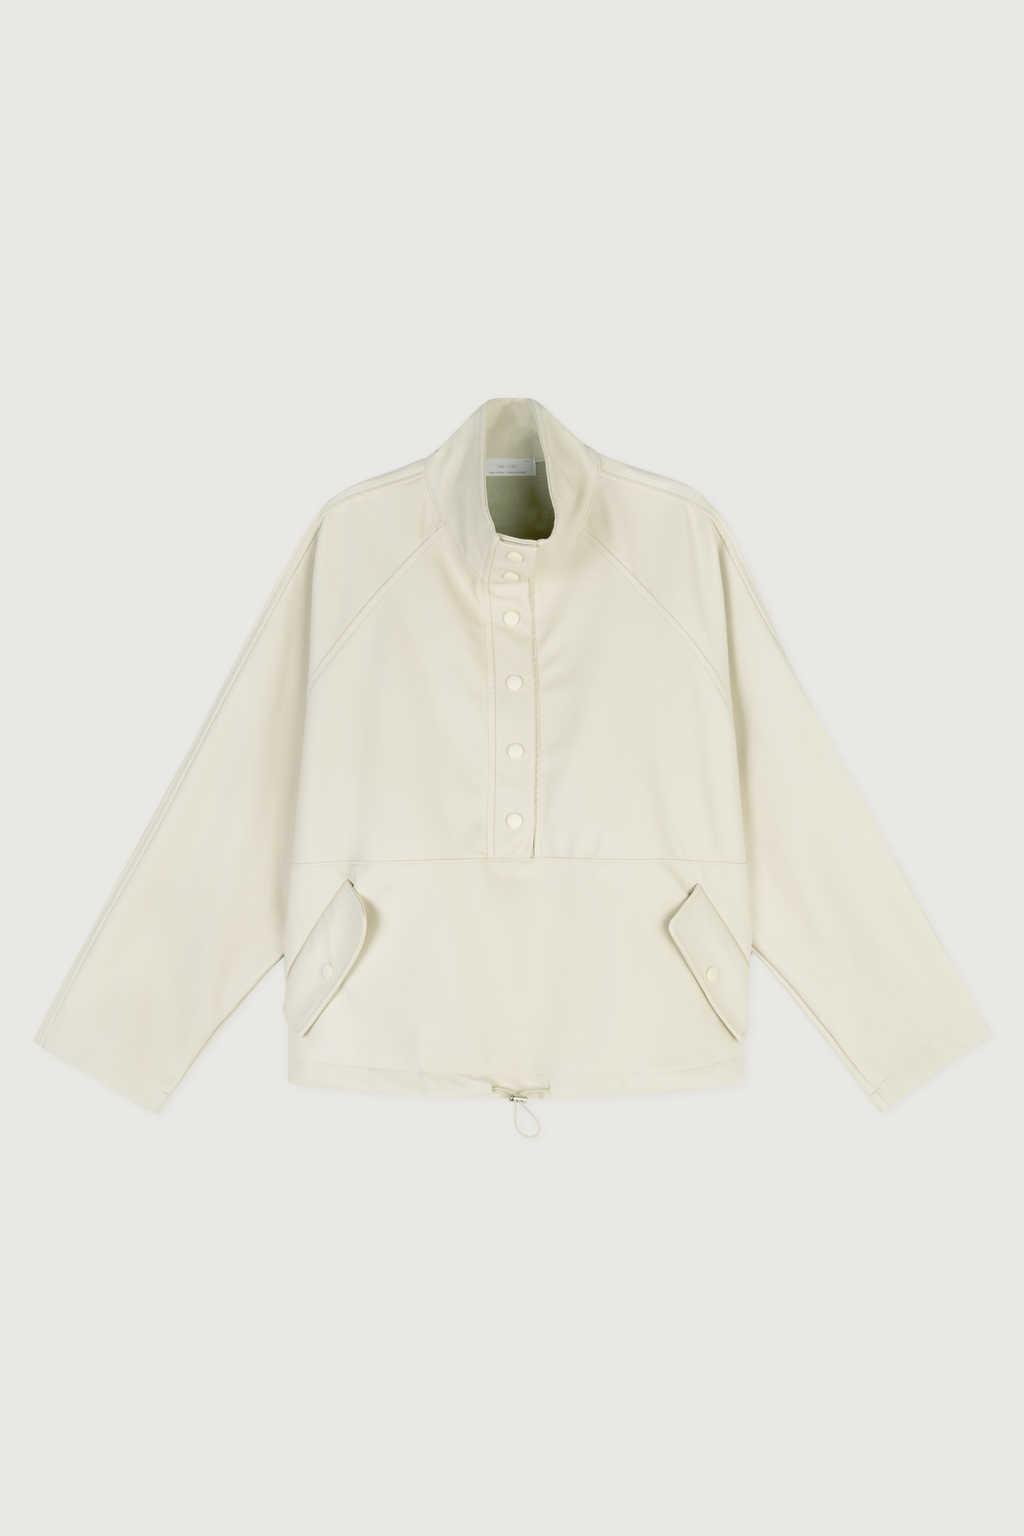 Jacket K001 Cream 5